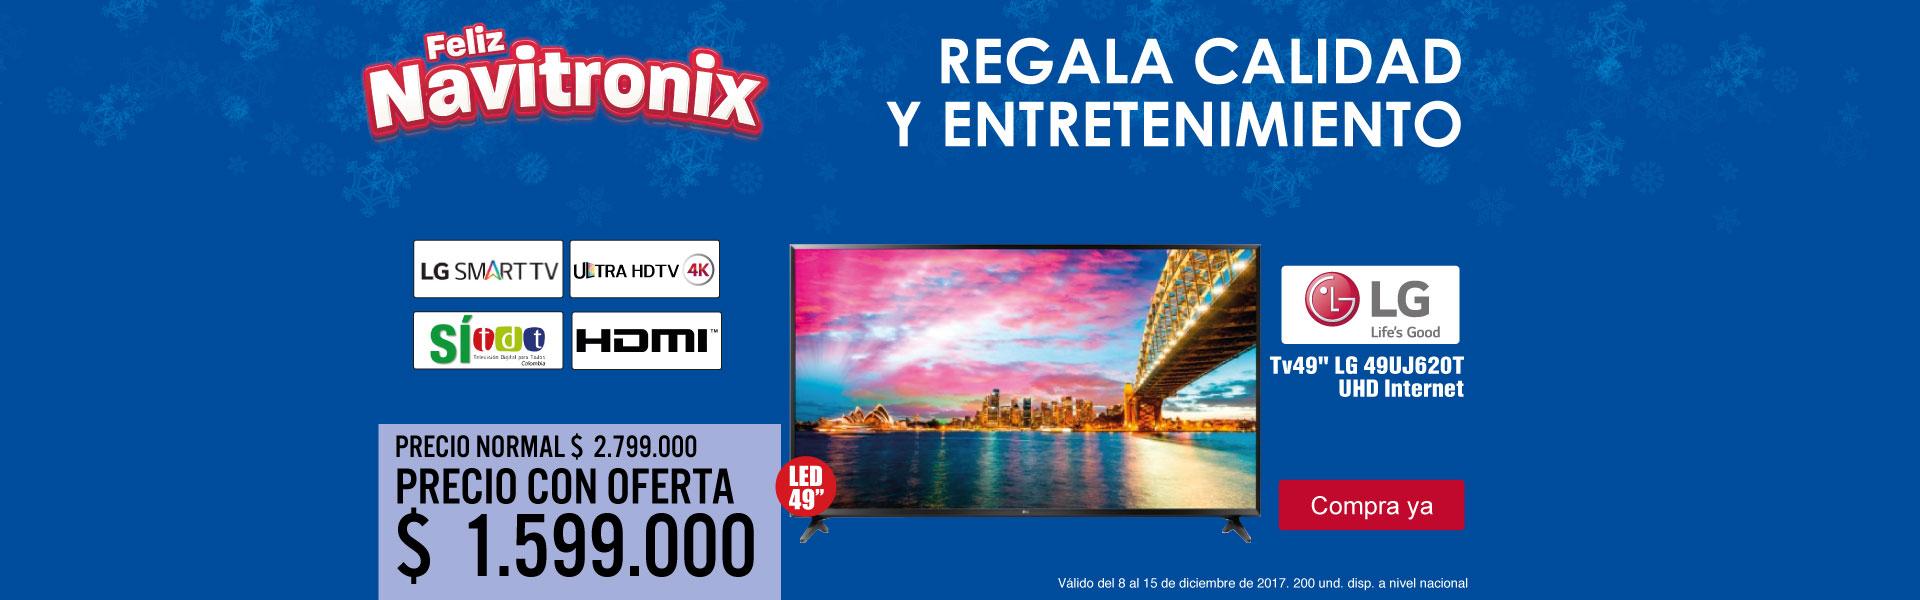 PPAL KT-2-TELEVISOR LG 49UJ620-TV-DIC11-15